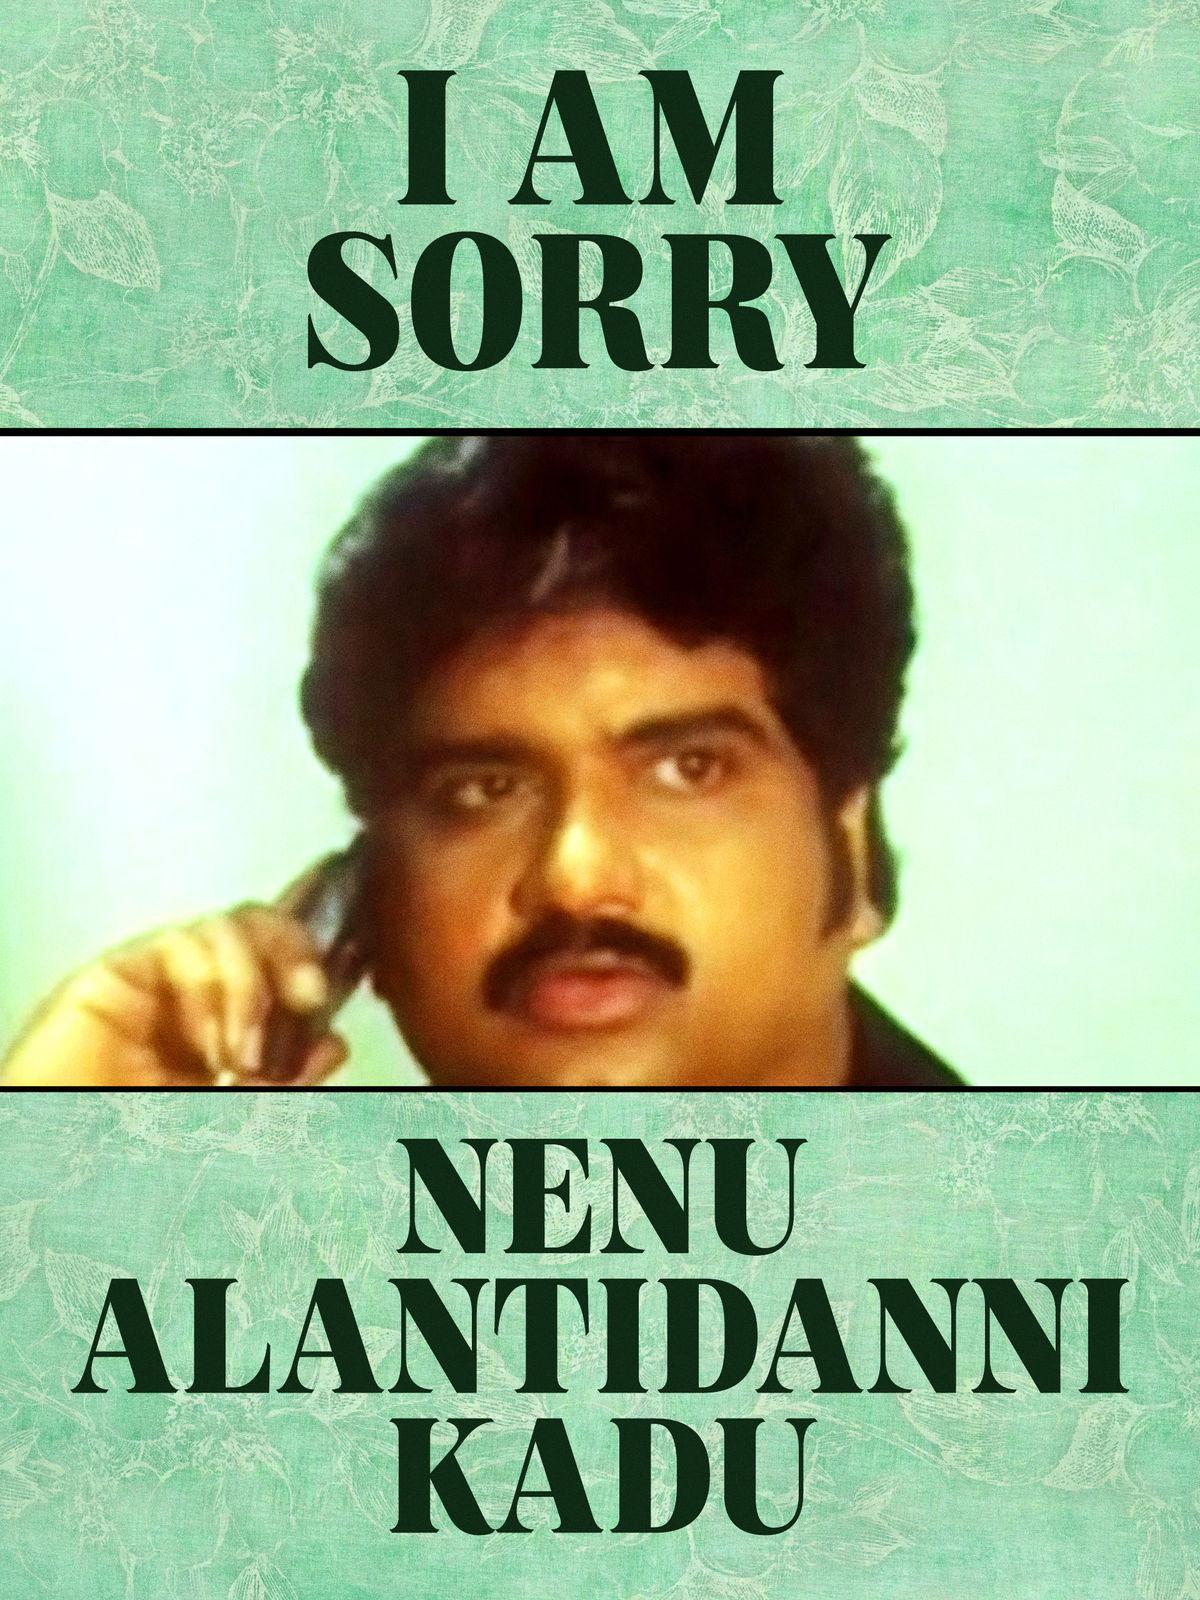 I Am Sorry Nenu Alantidanni Kadu